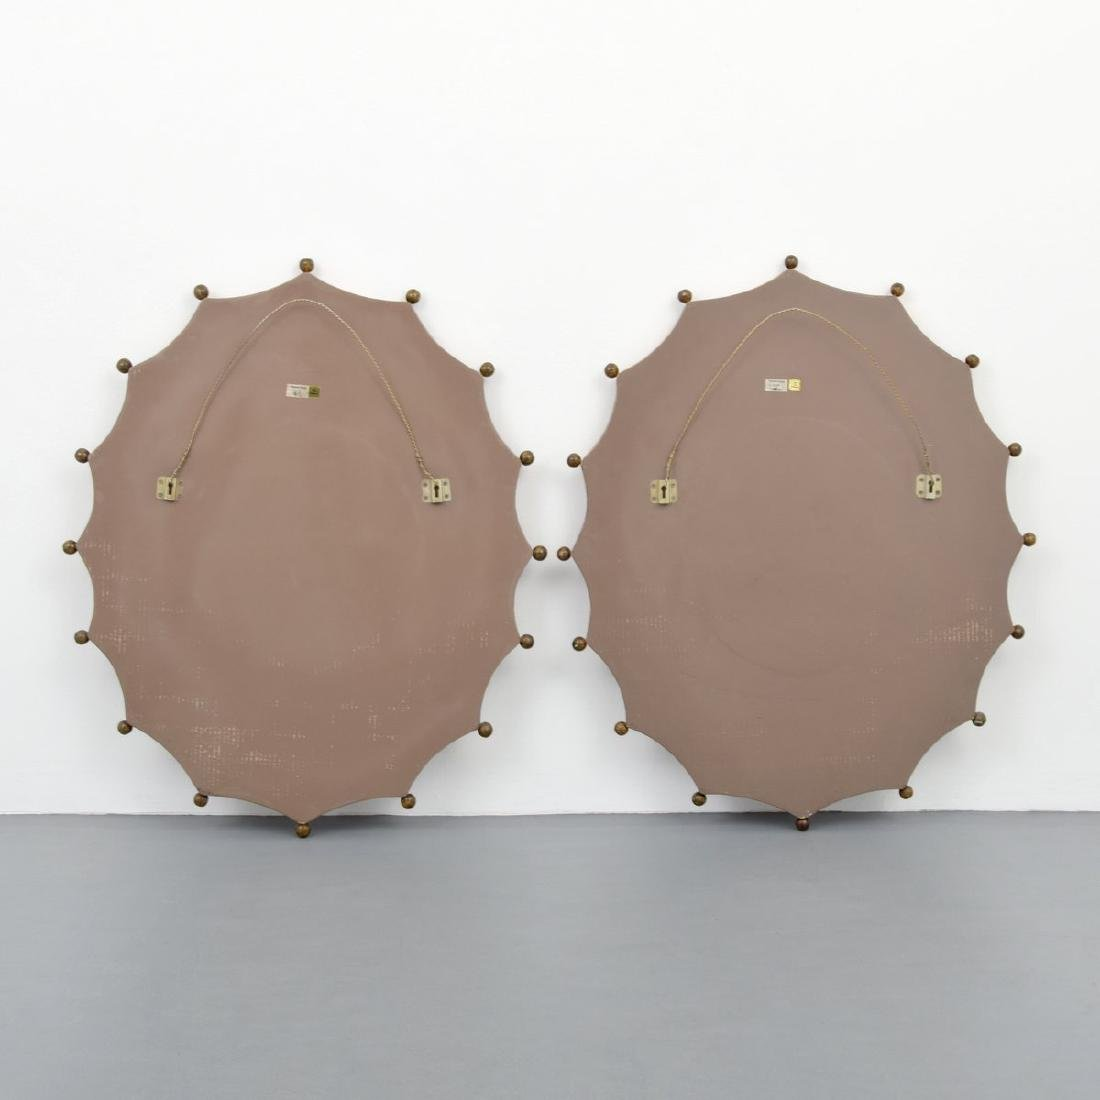 Pair of Mirrors, Manner of Karl Springer - 4